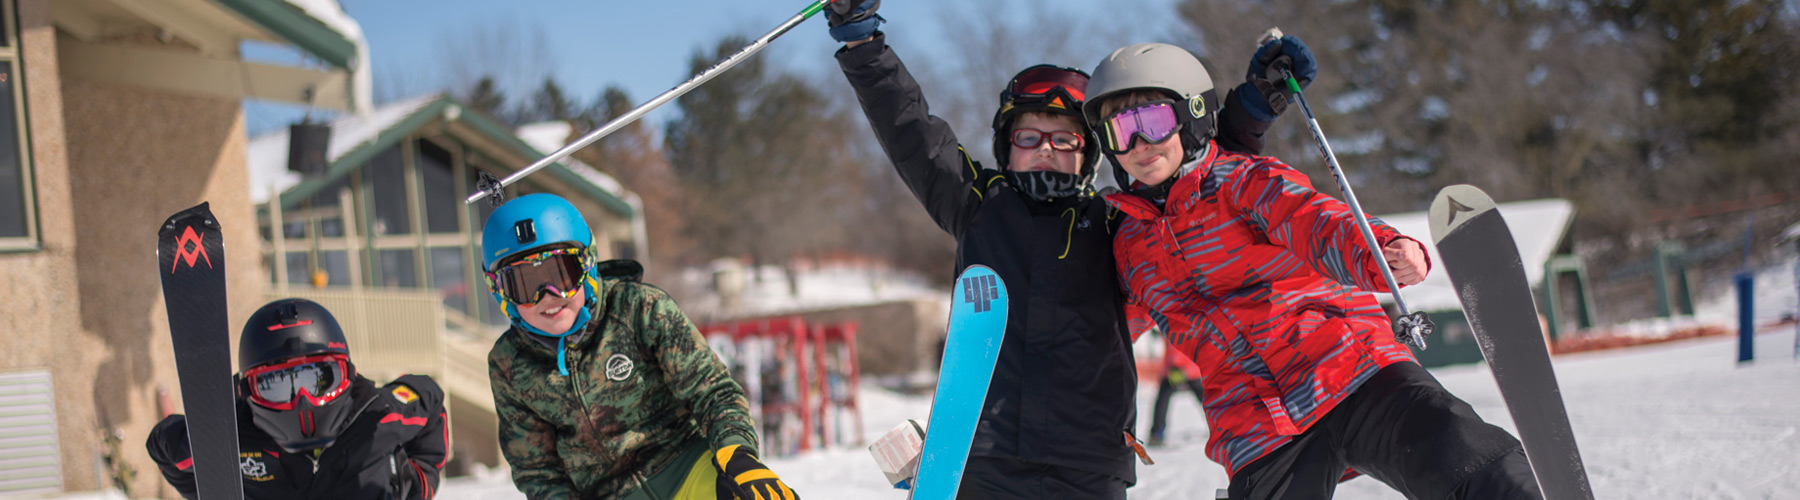 Ski Groups